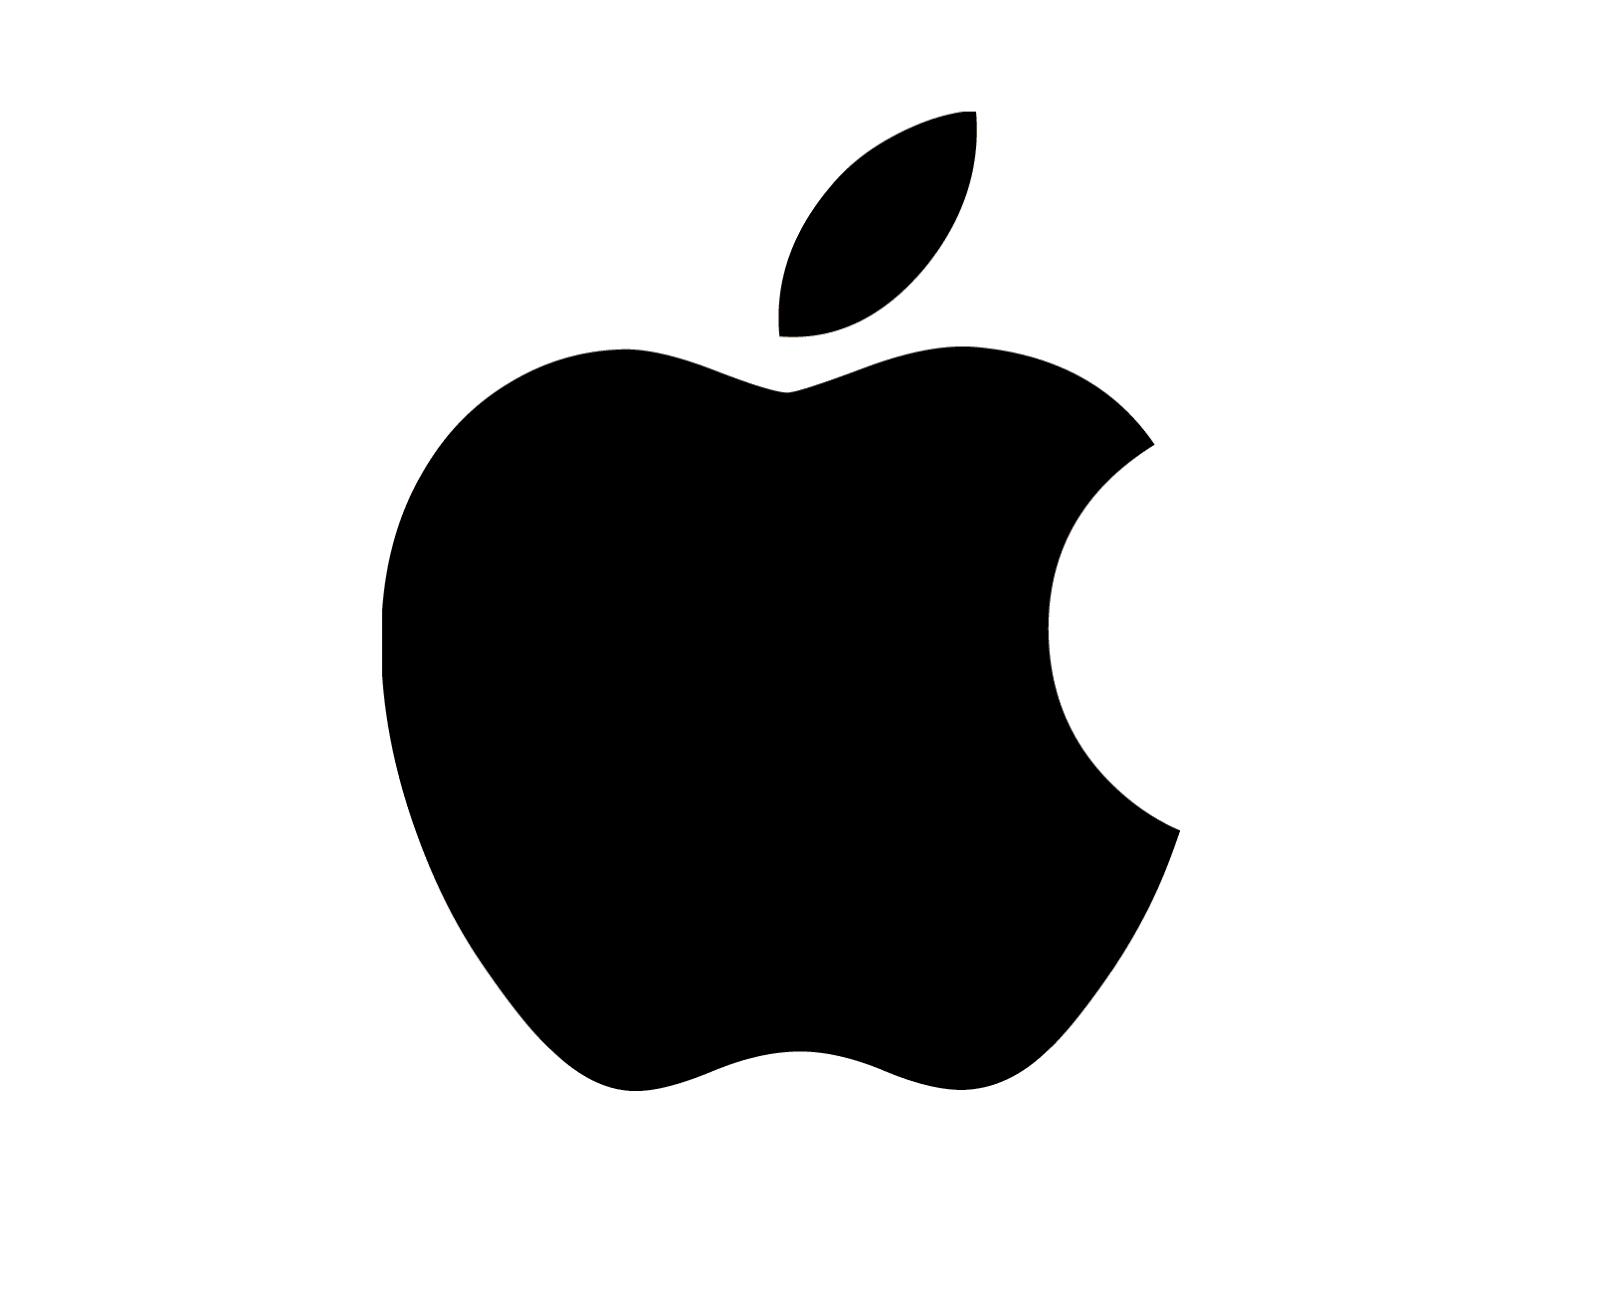 Apple HD PNG - 92818